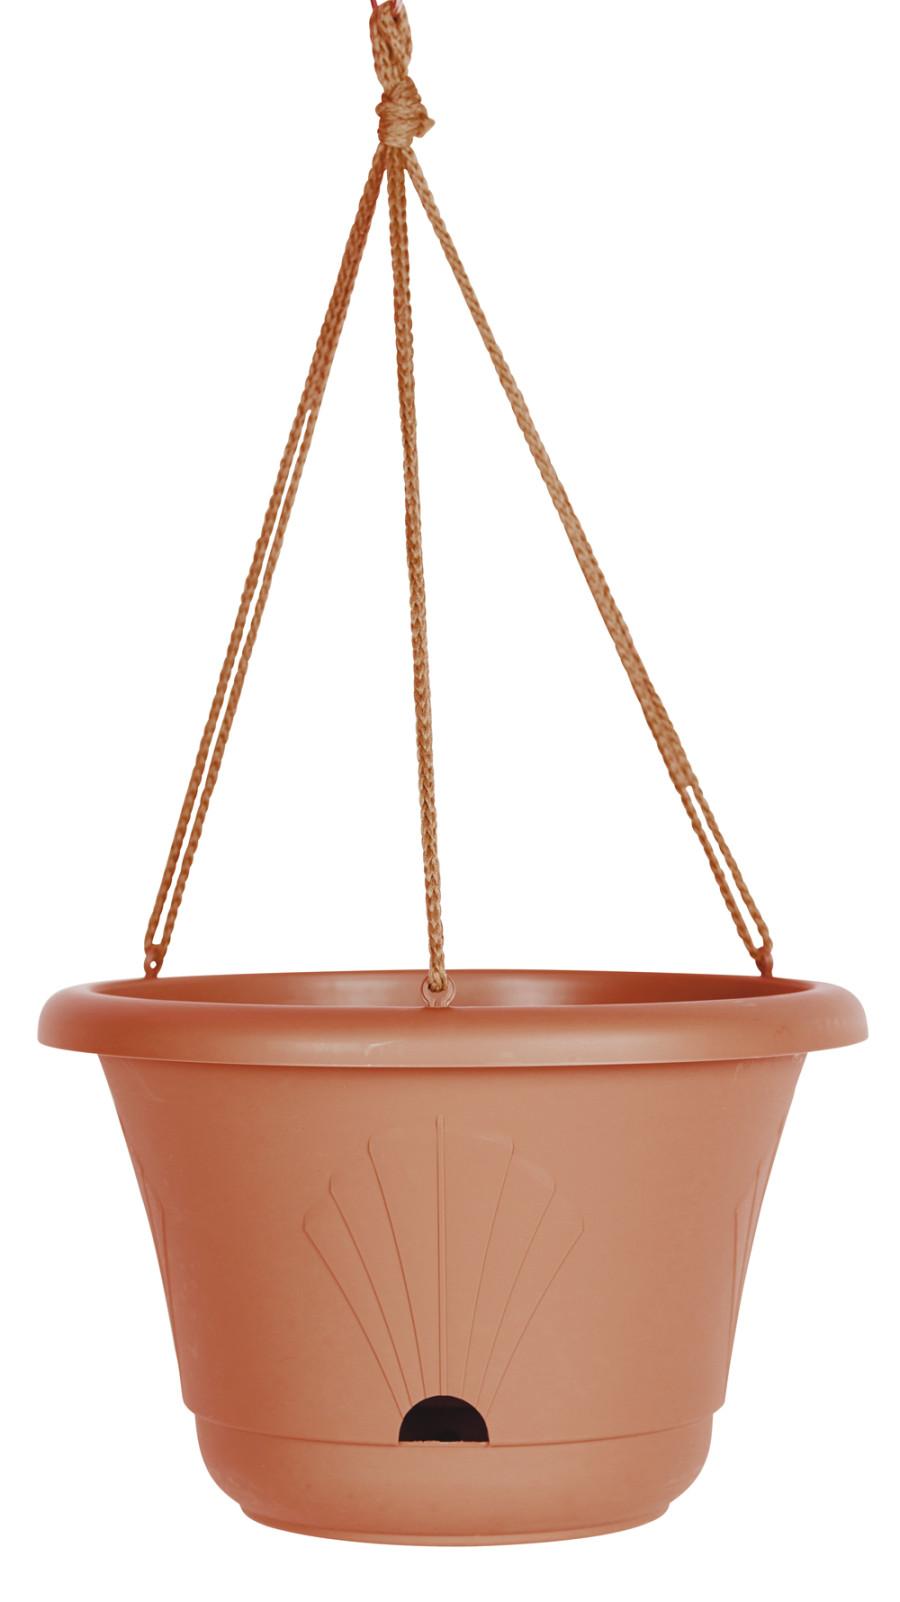 Bloem Lucca Hanging Basket Planter Terra Cotta 10ea/13 in